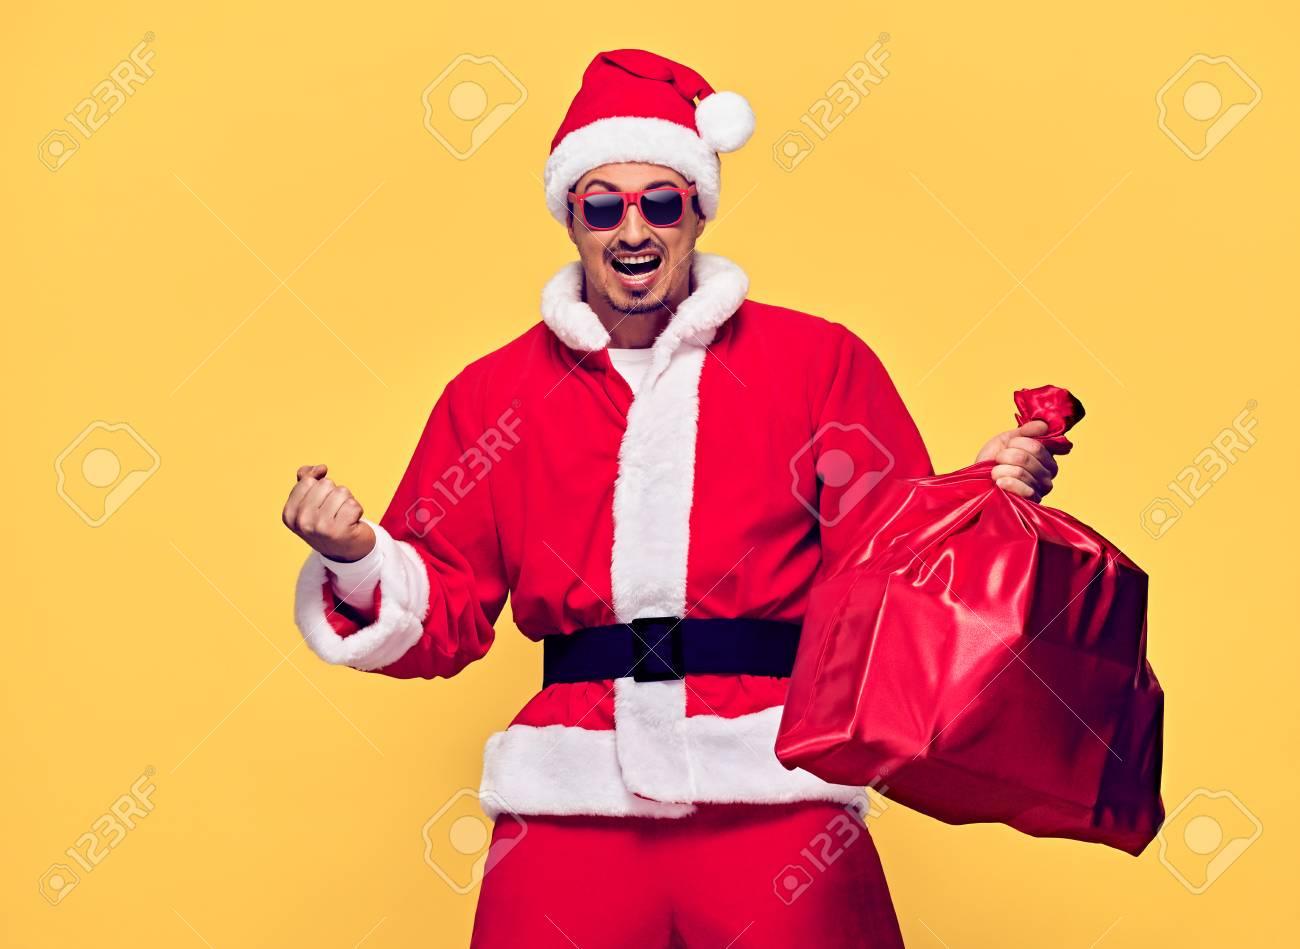 Santa Claus. Young Happy Santa Man Winner Gesture. Handsome Fashion..